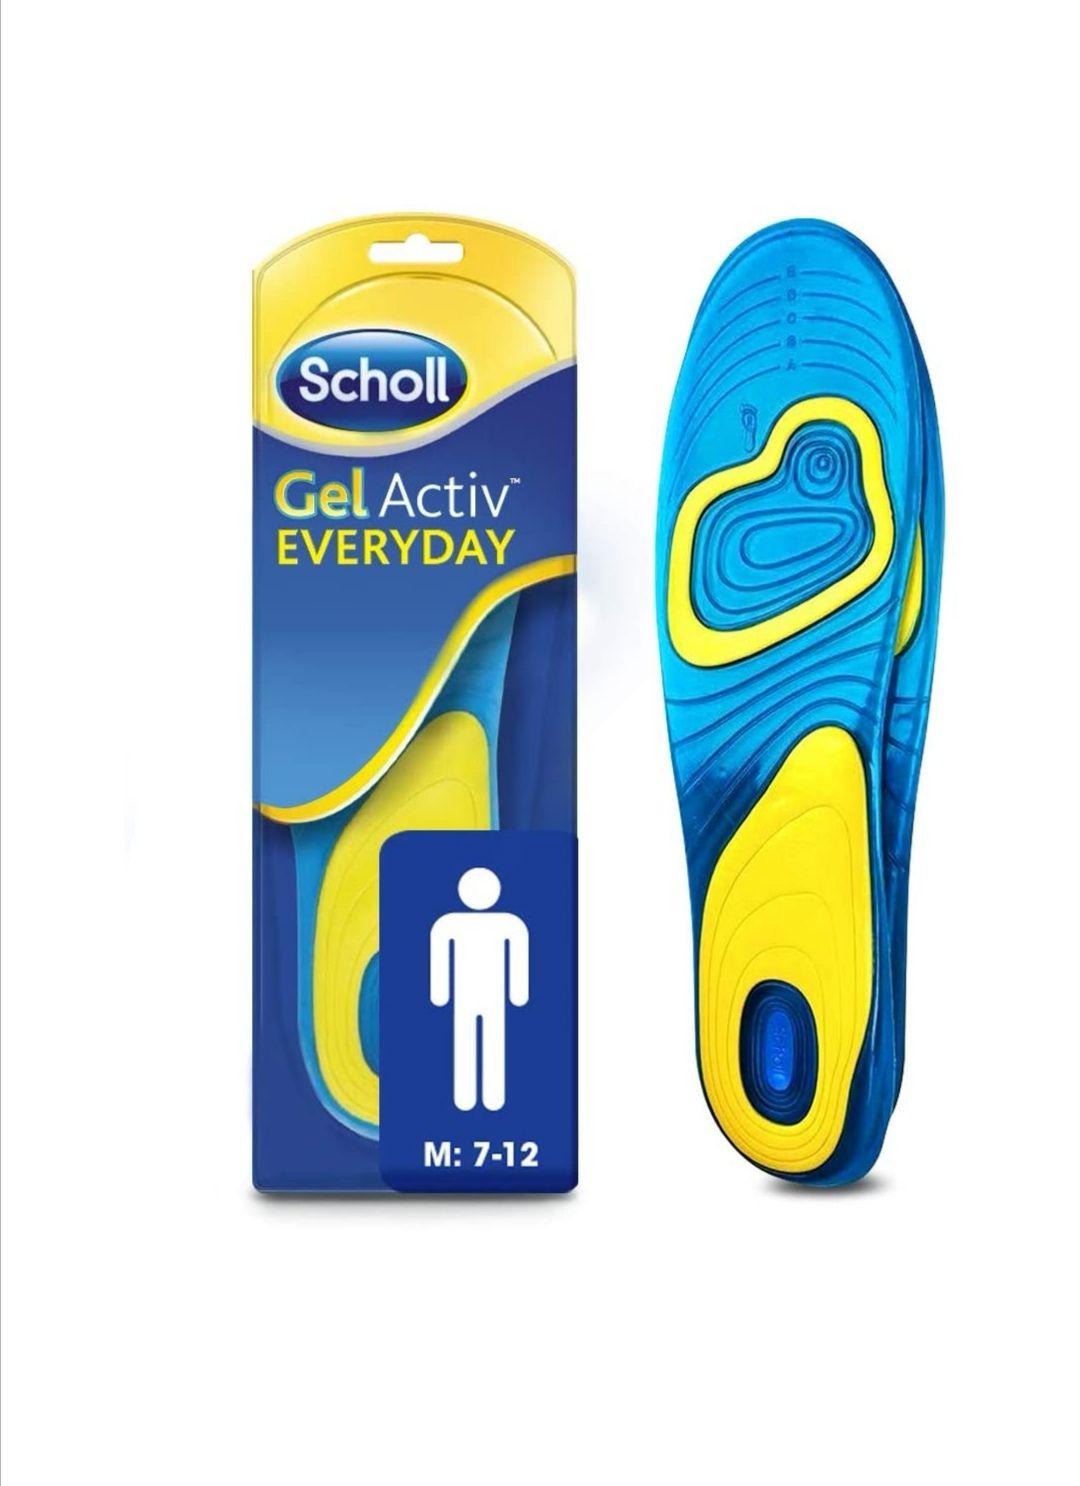 Scholl Men's Gel Activ Everyday Insoles, UK Size 7 to 12 - £8.49 (+£4.49 non-Prime) @ Amazon